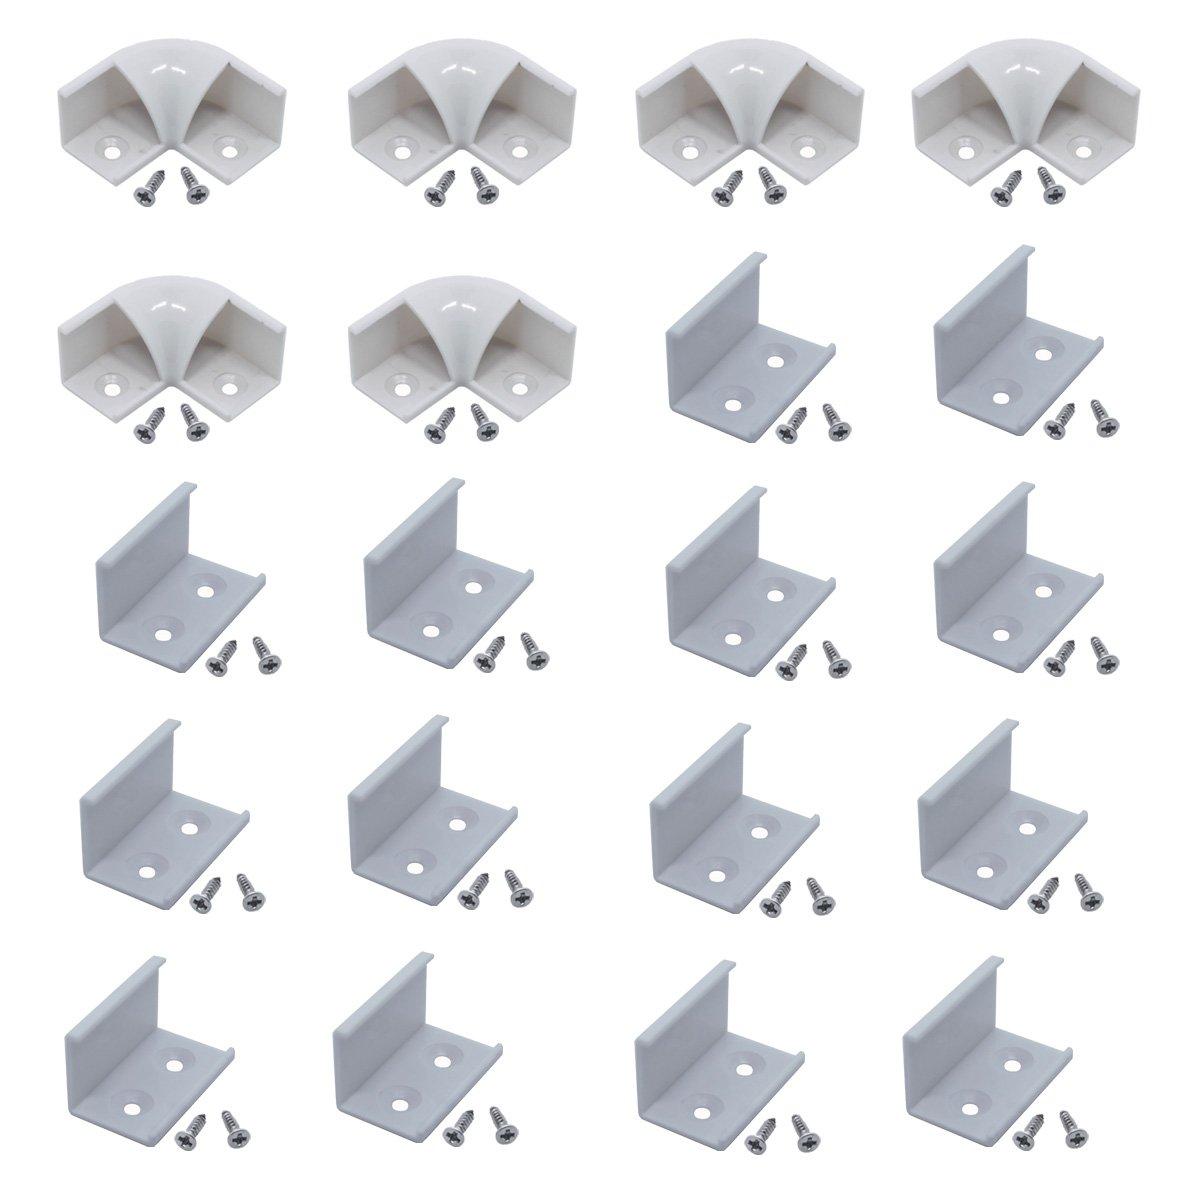 Litever 90 Degrees Corner Connectors, ONLY for Litever Slim V Shape LED Strip Aluminum Channels, Screws Included, LL-016-90D